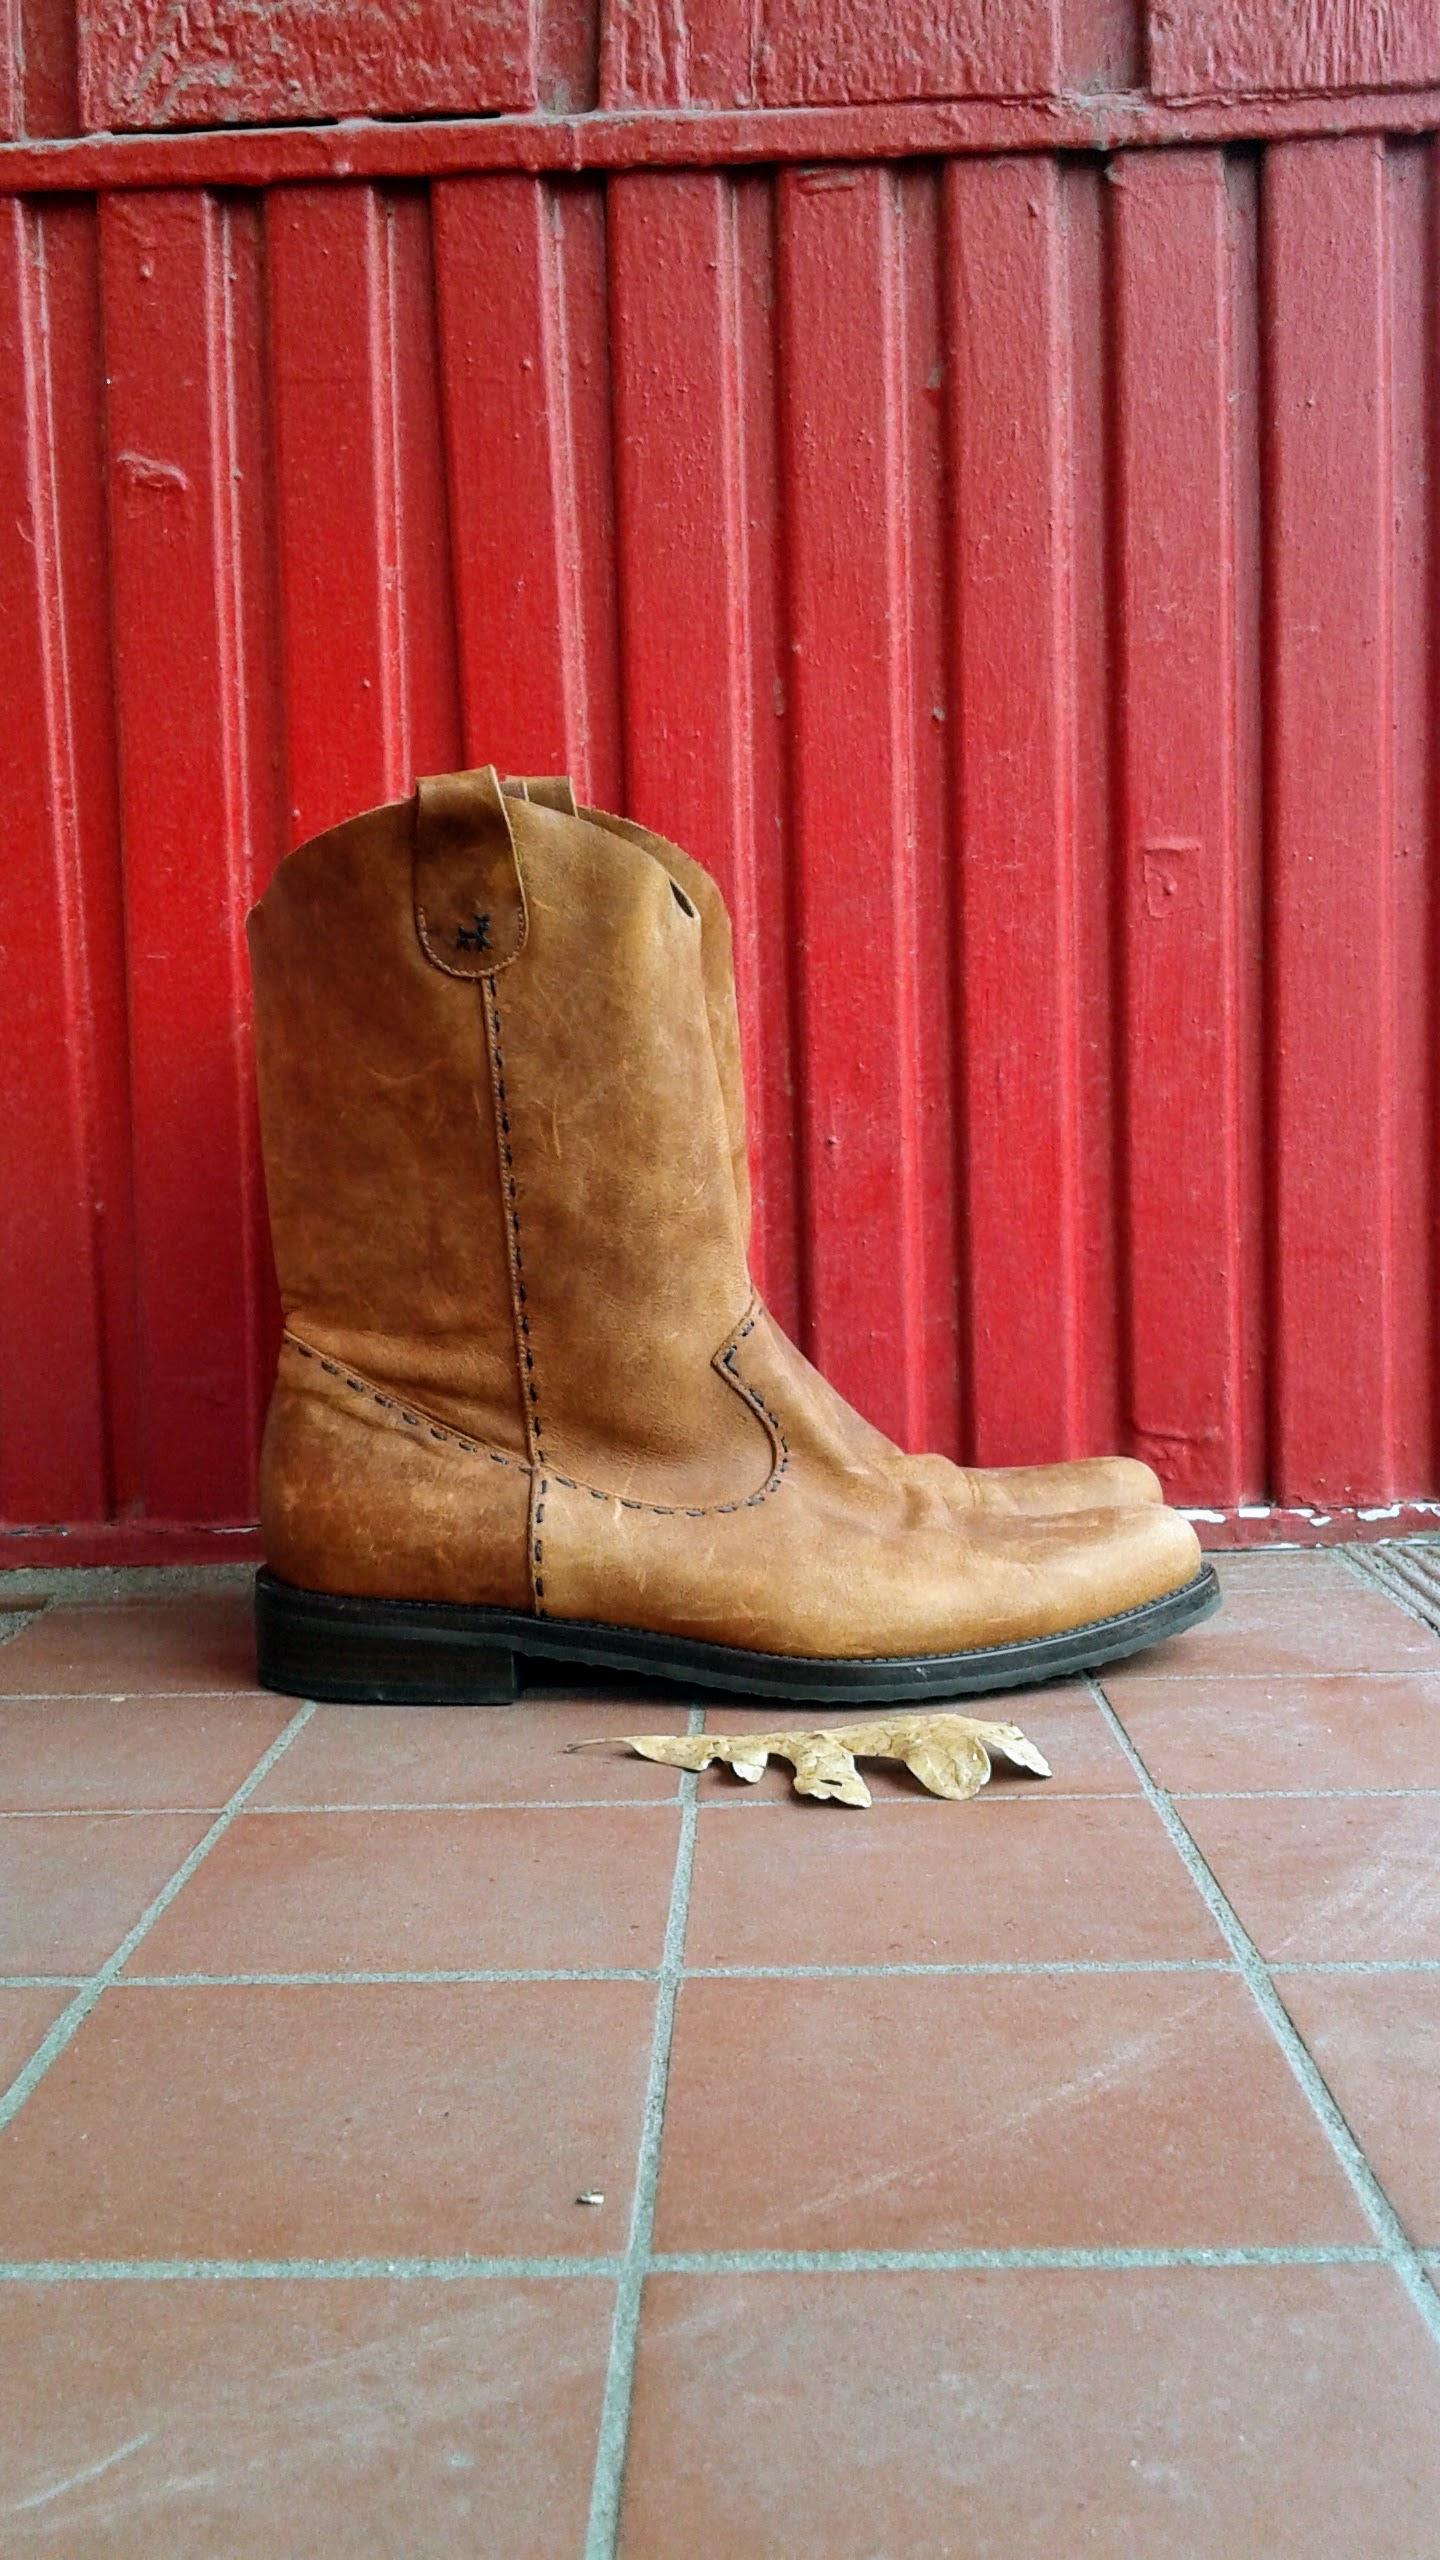 Barneys New York boots; S7.5, $72